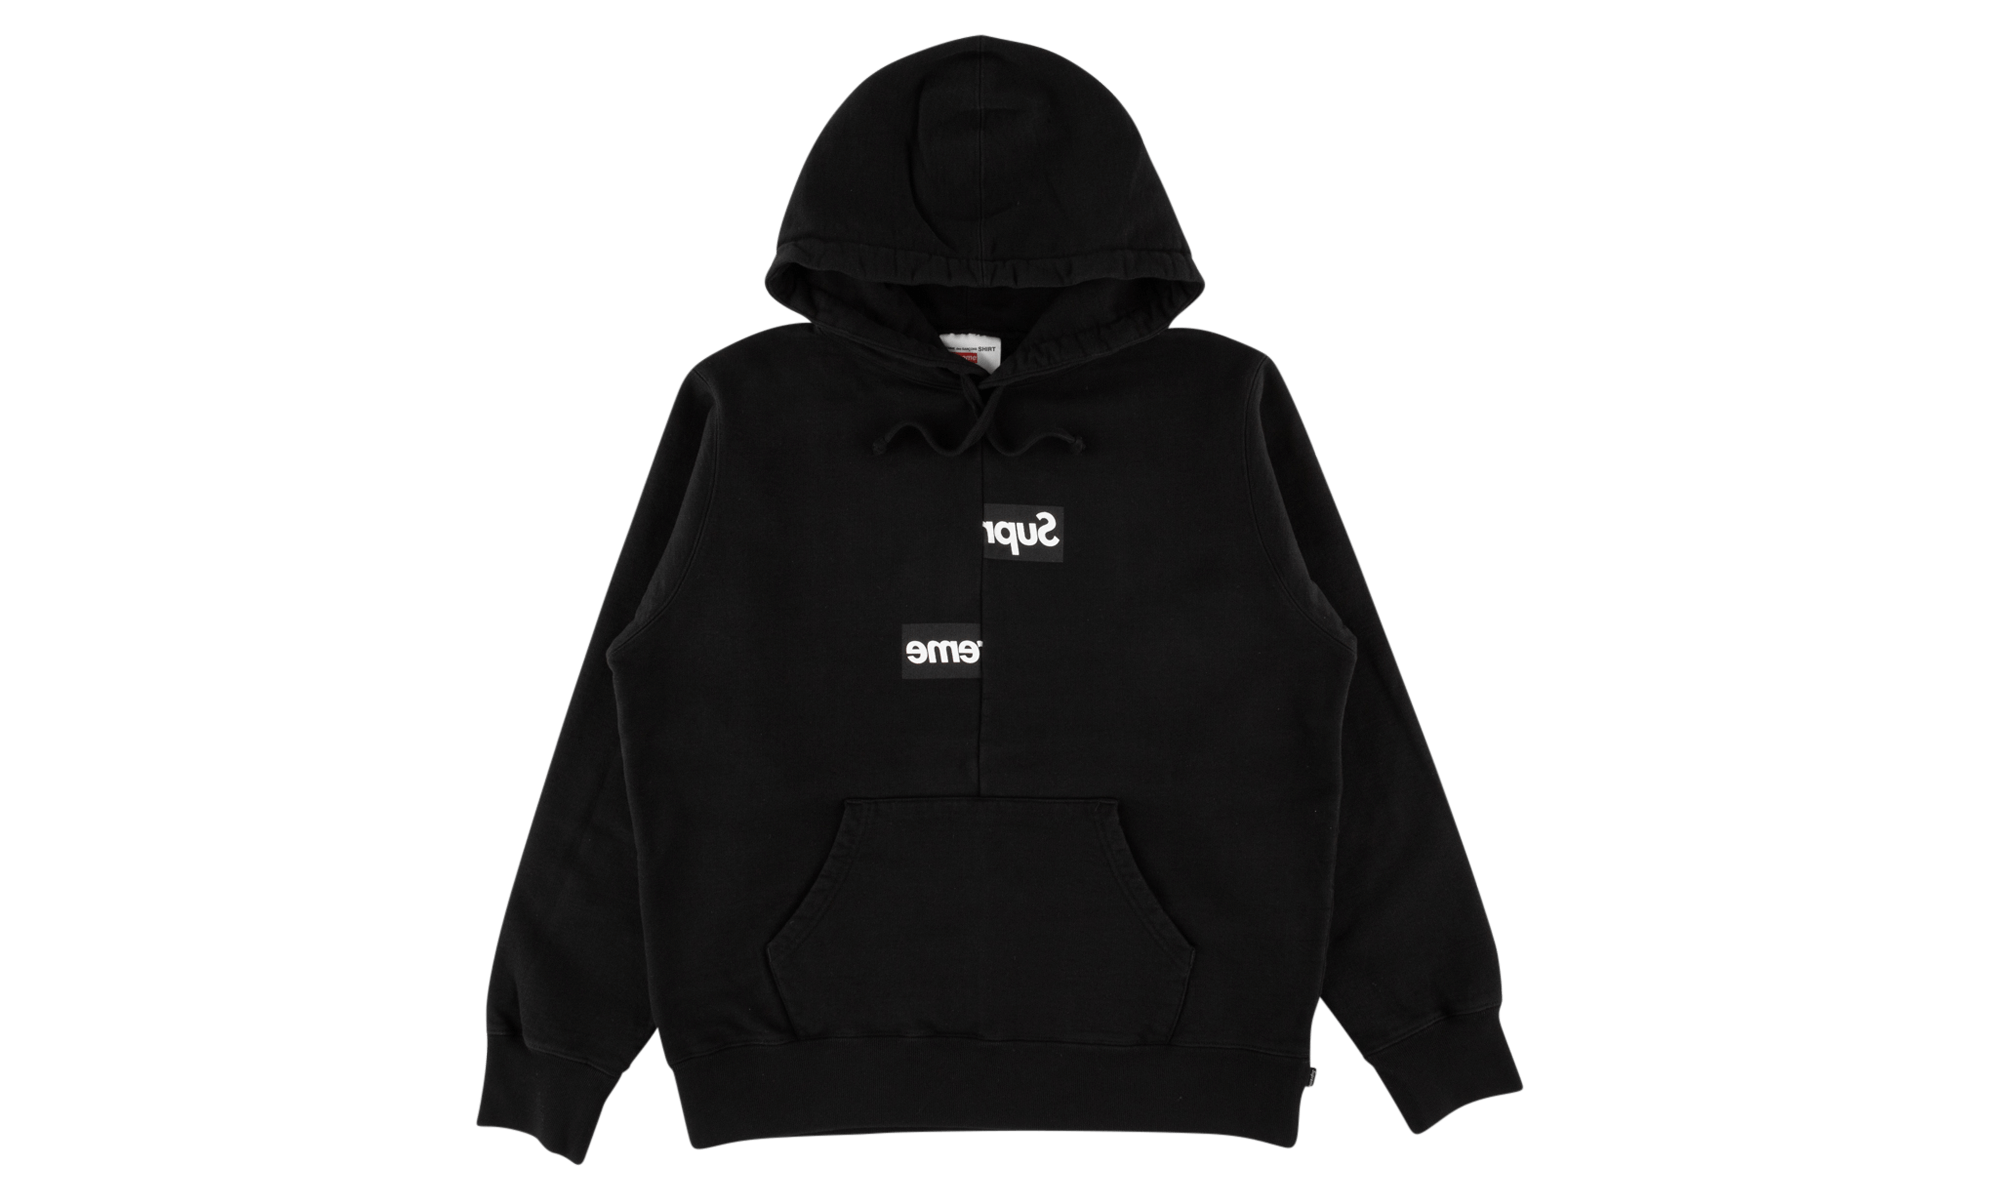 Supreme Cdg Split Box Logo Hooded Sweatshirt Su5626 In 2021 Supreme Sweatshirt Hooded Sweatshirts Supreme Hoodie [ 1200 x 2000 Pixel ]